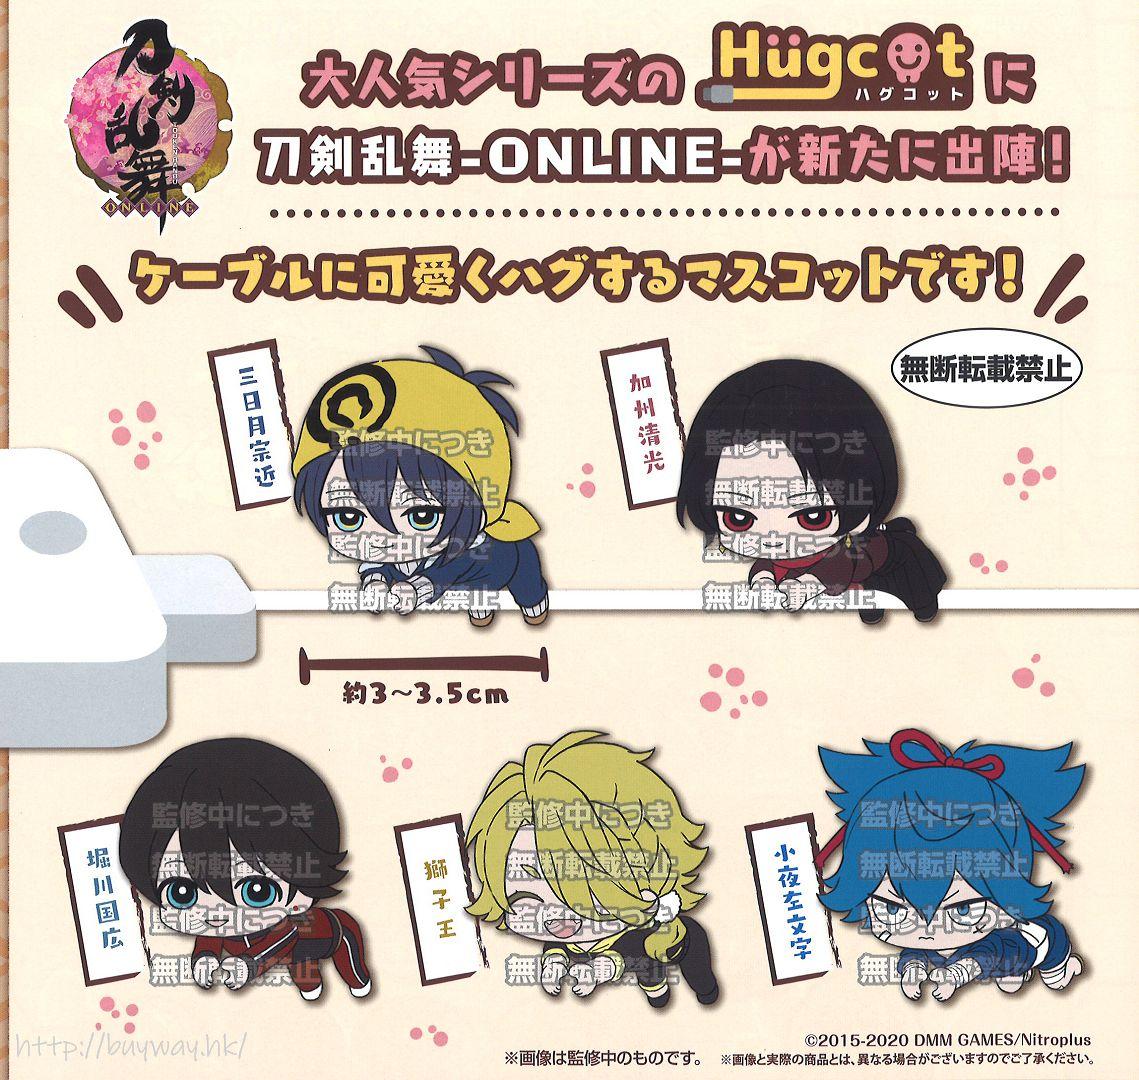 刀劍亂舞-ONLINE- Hugcot 傳輸線裝飾 扭蛋 (40 個入) Hugcot (40 Pieces)【Touken Ranbu -ONLINE-】